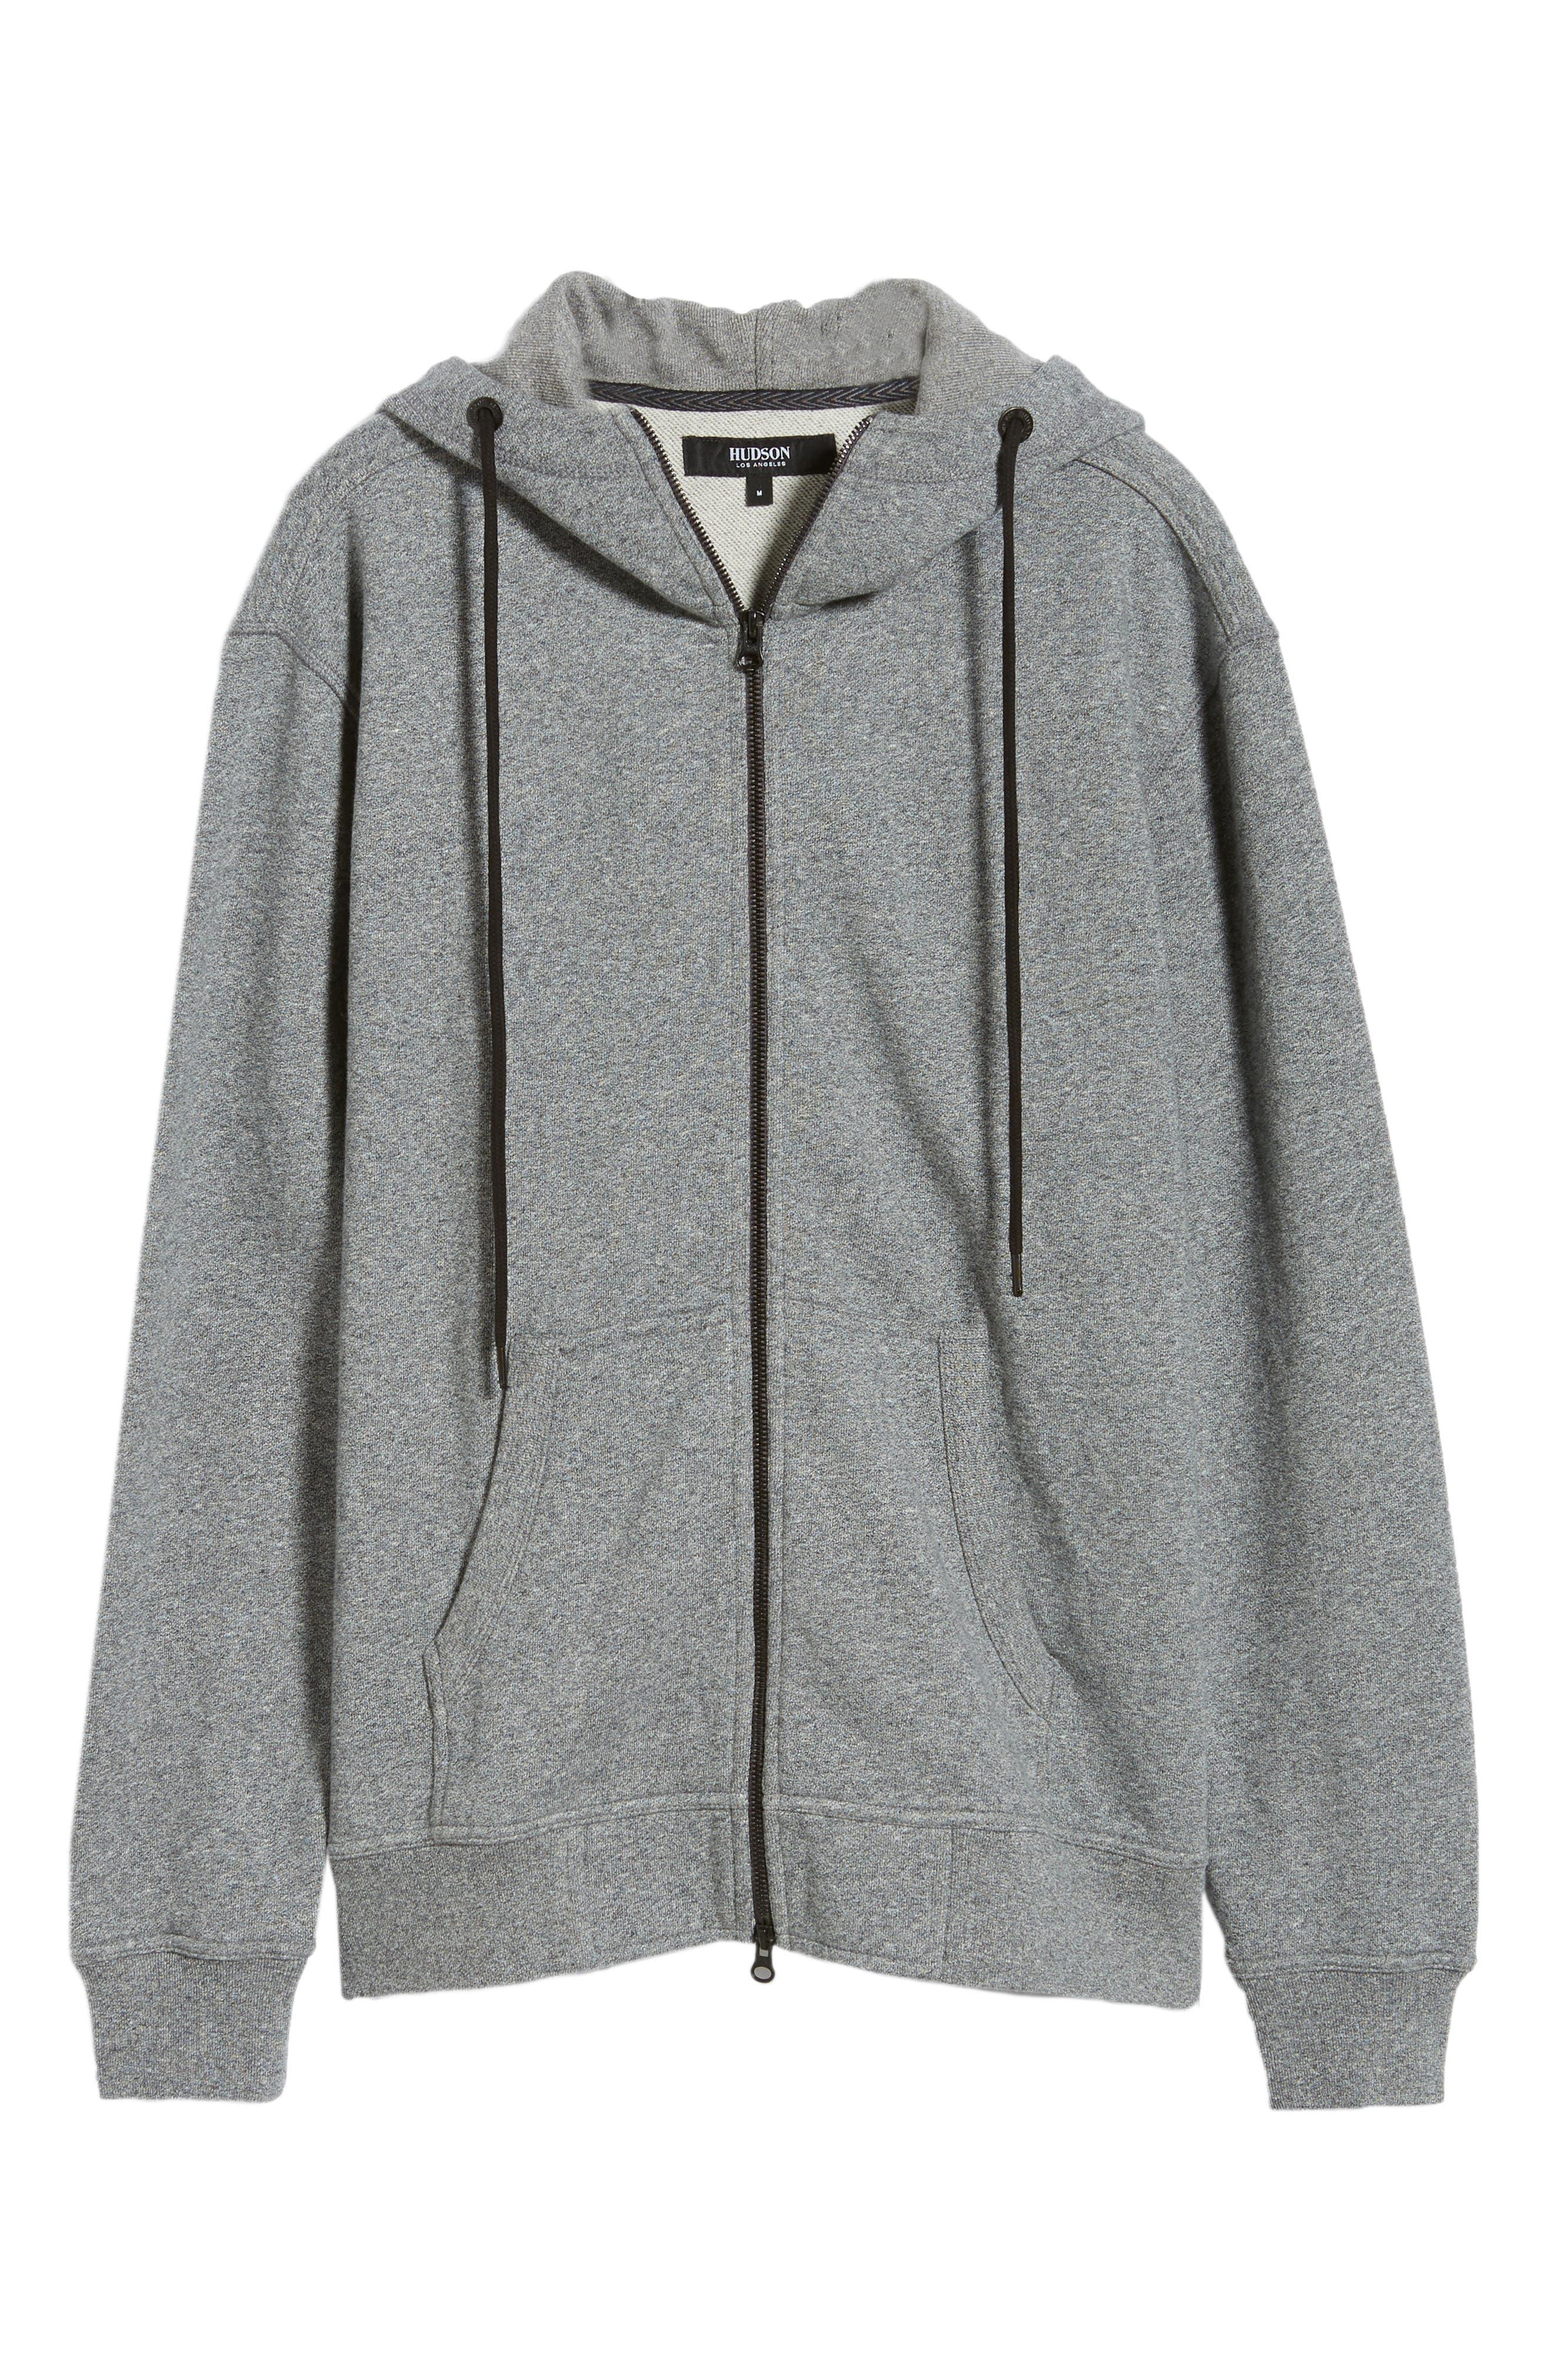 Regular Fit Hooded Zip Sweatshirt,                             Alternate thumbnail 6, color,                             HEATHER GREY